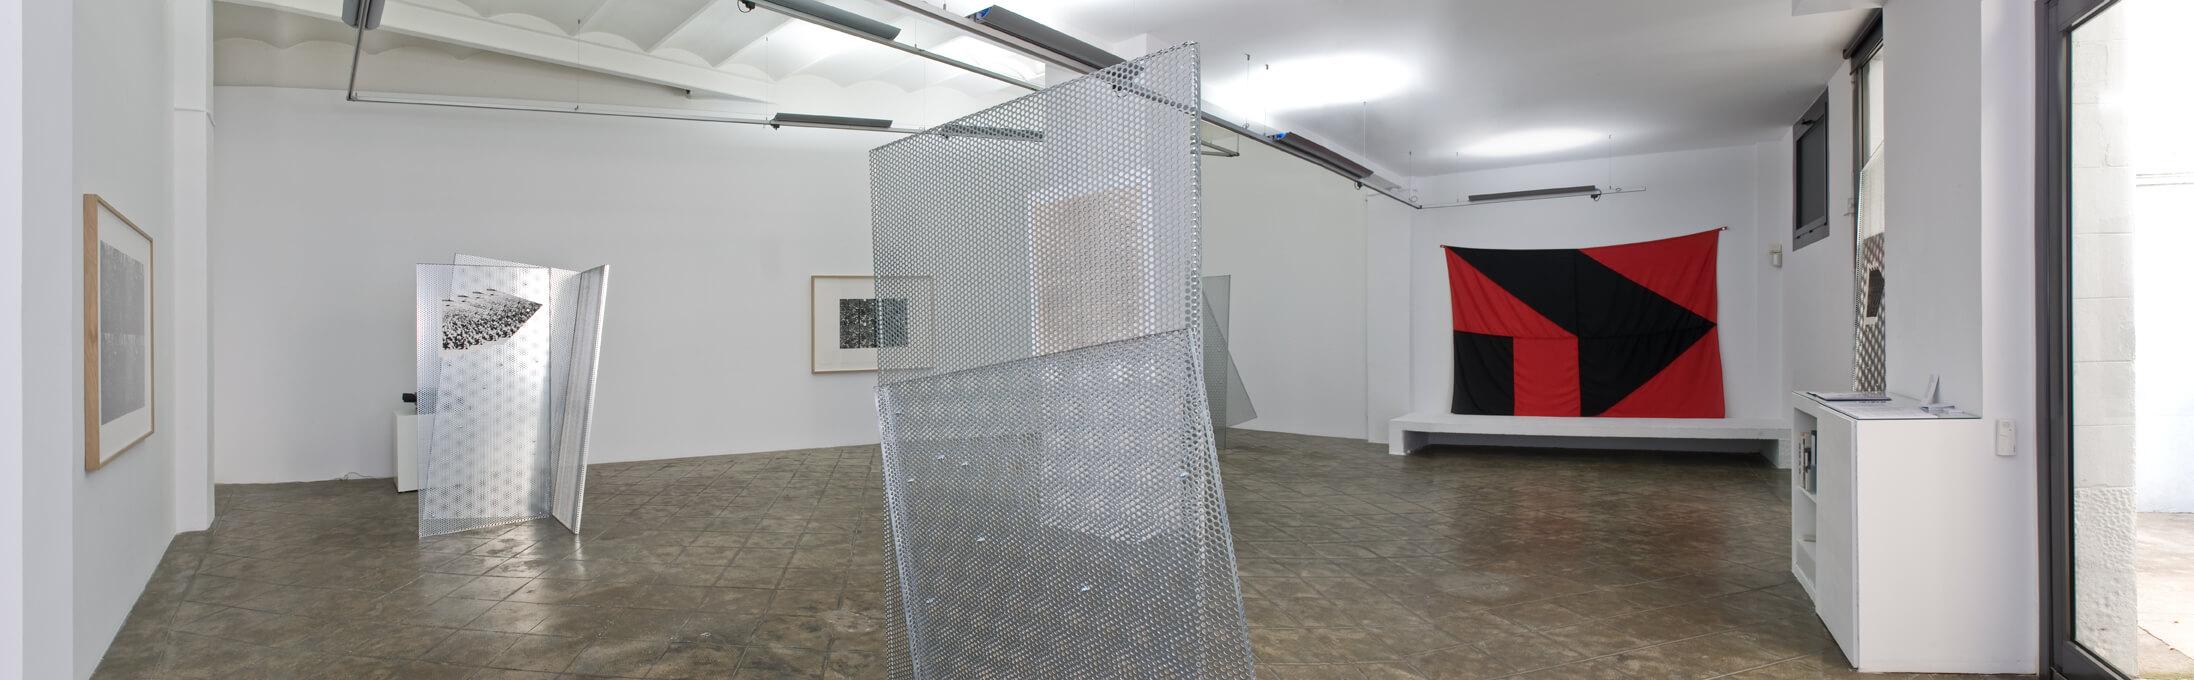 Installation view: Asier Mendizabal, ProjecteSD, Barcelona | Asier Mendizabal | ProjecteSD